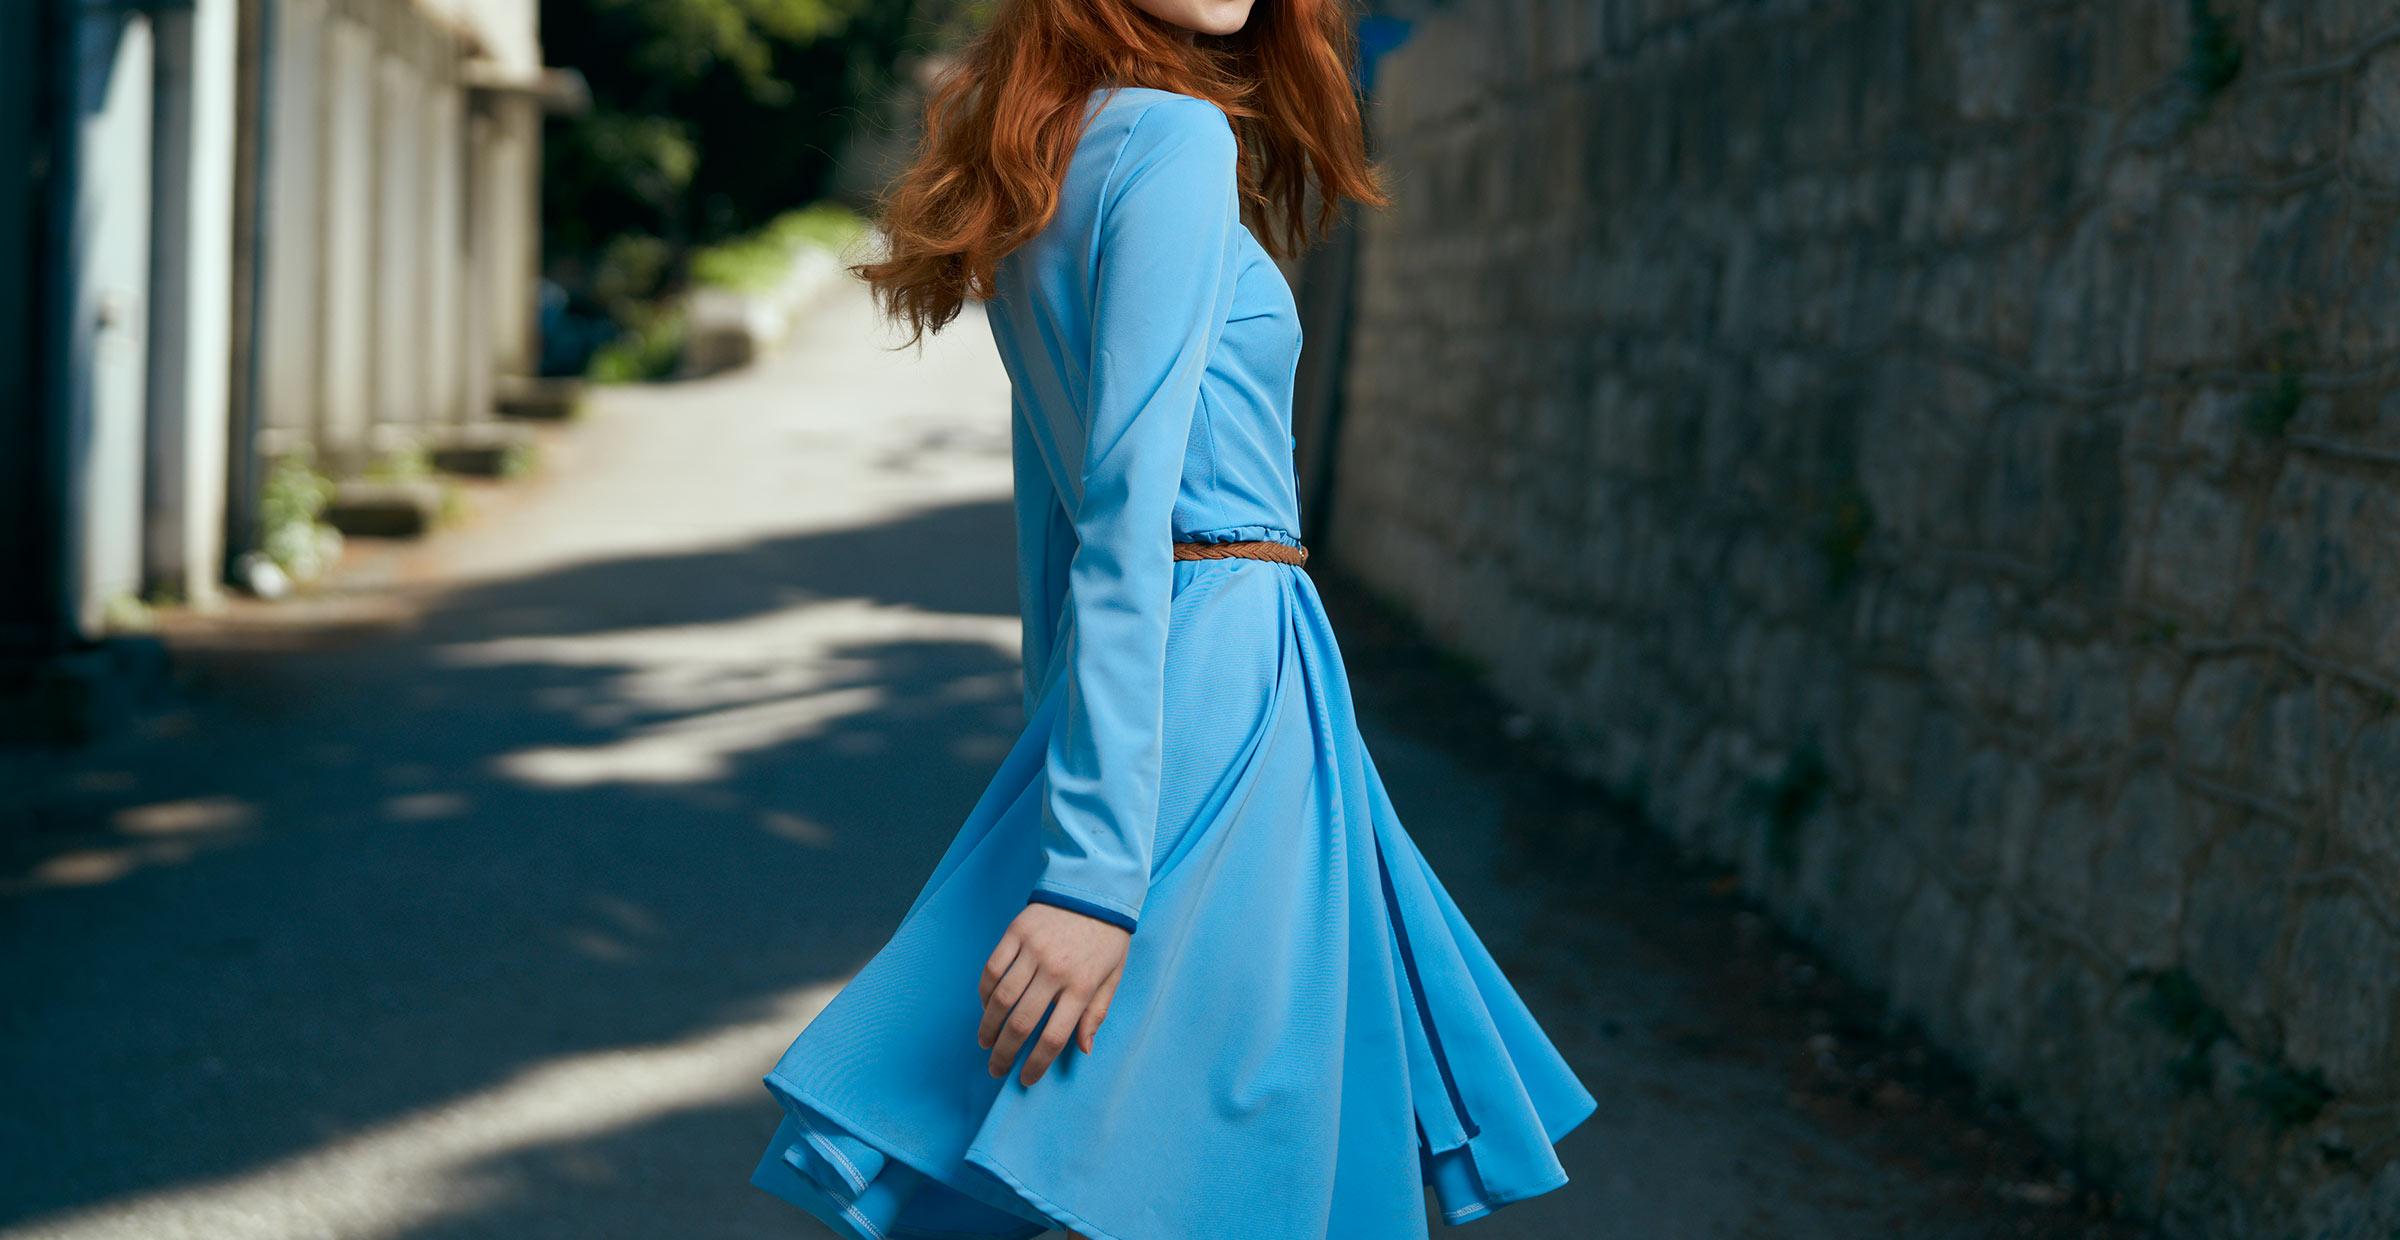 Long-sleeve blue fall dress